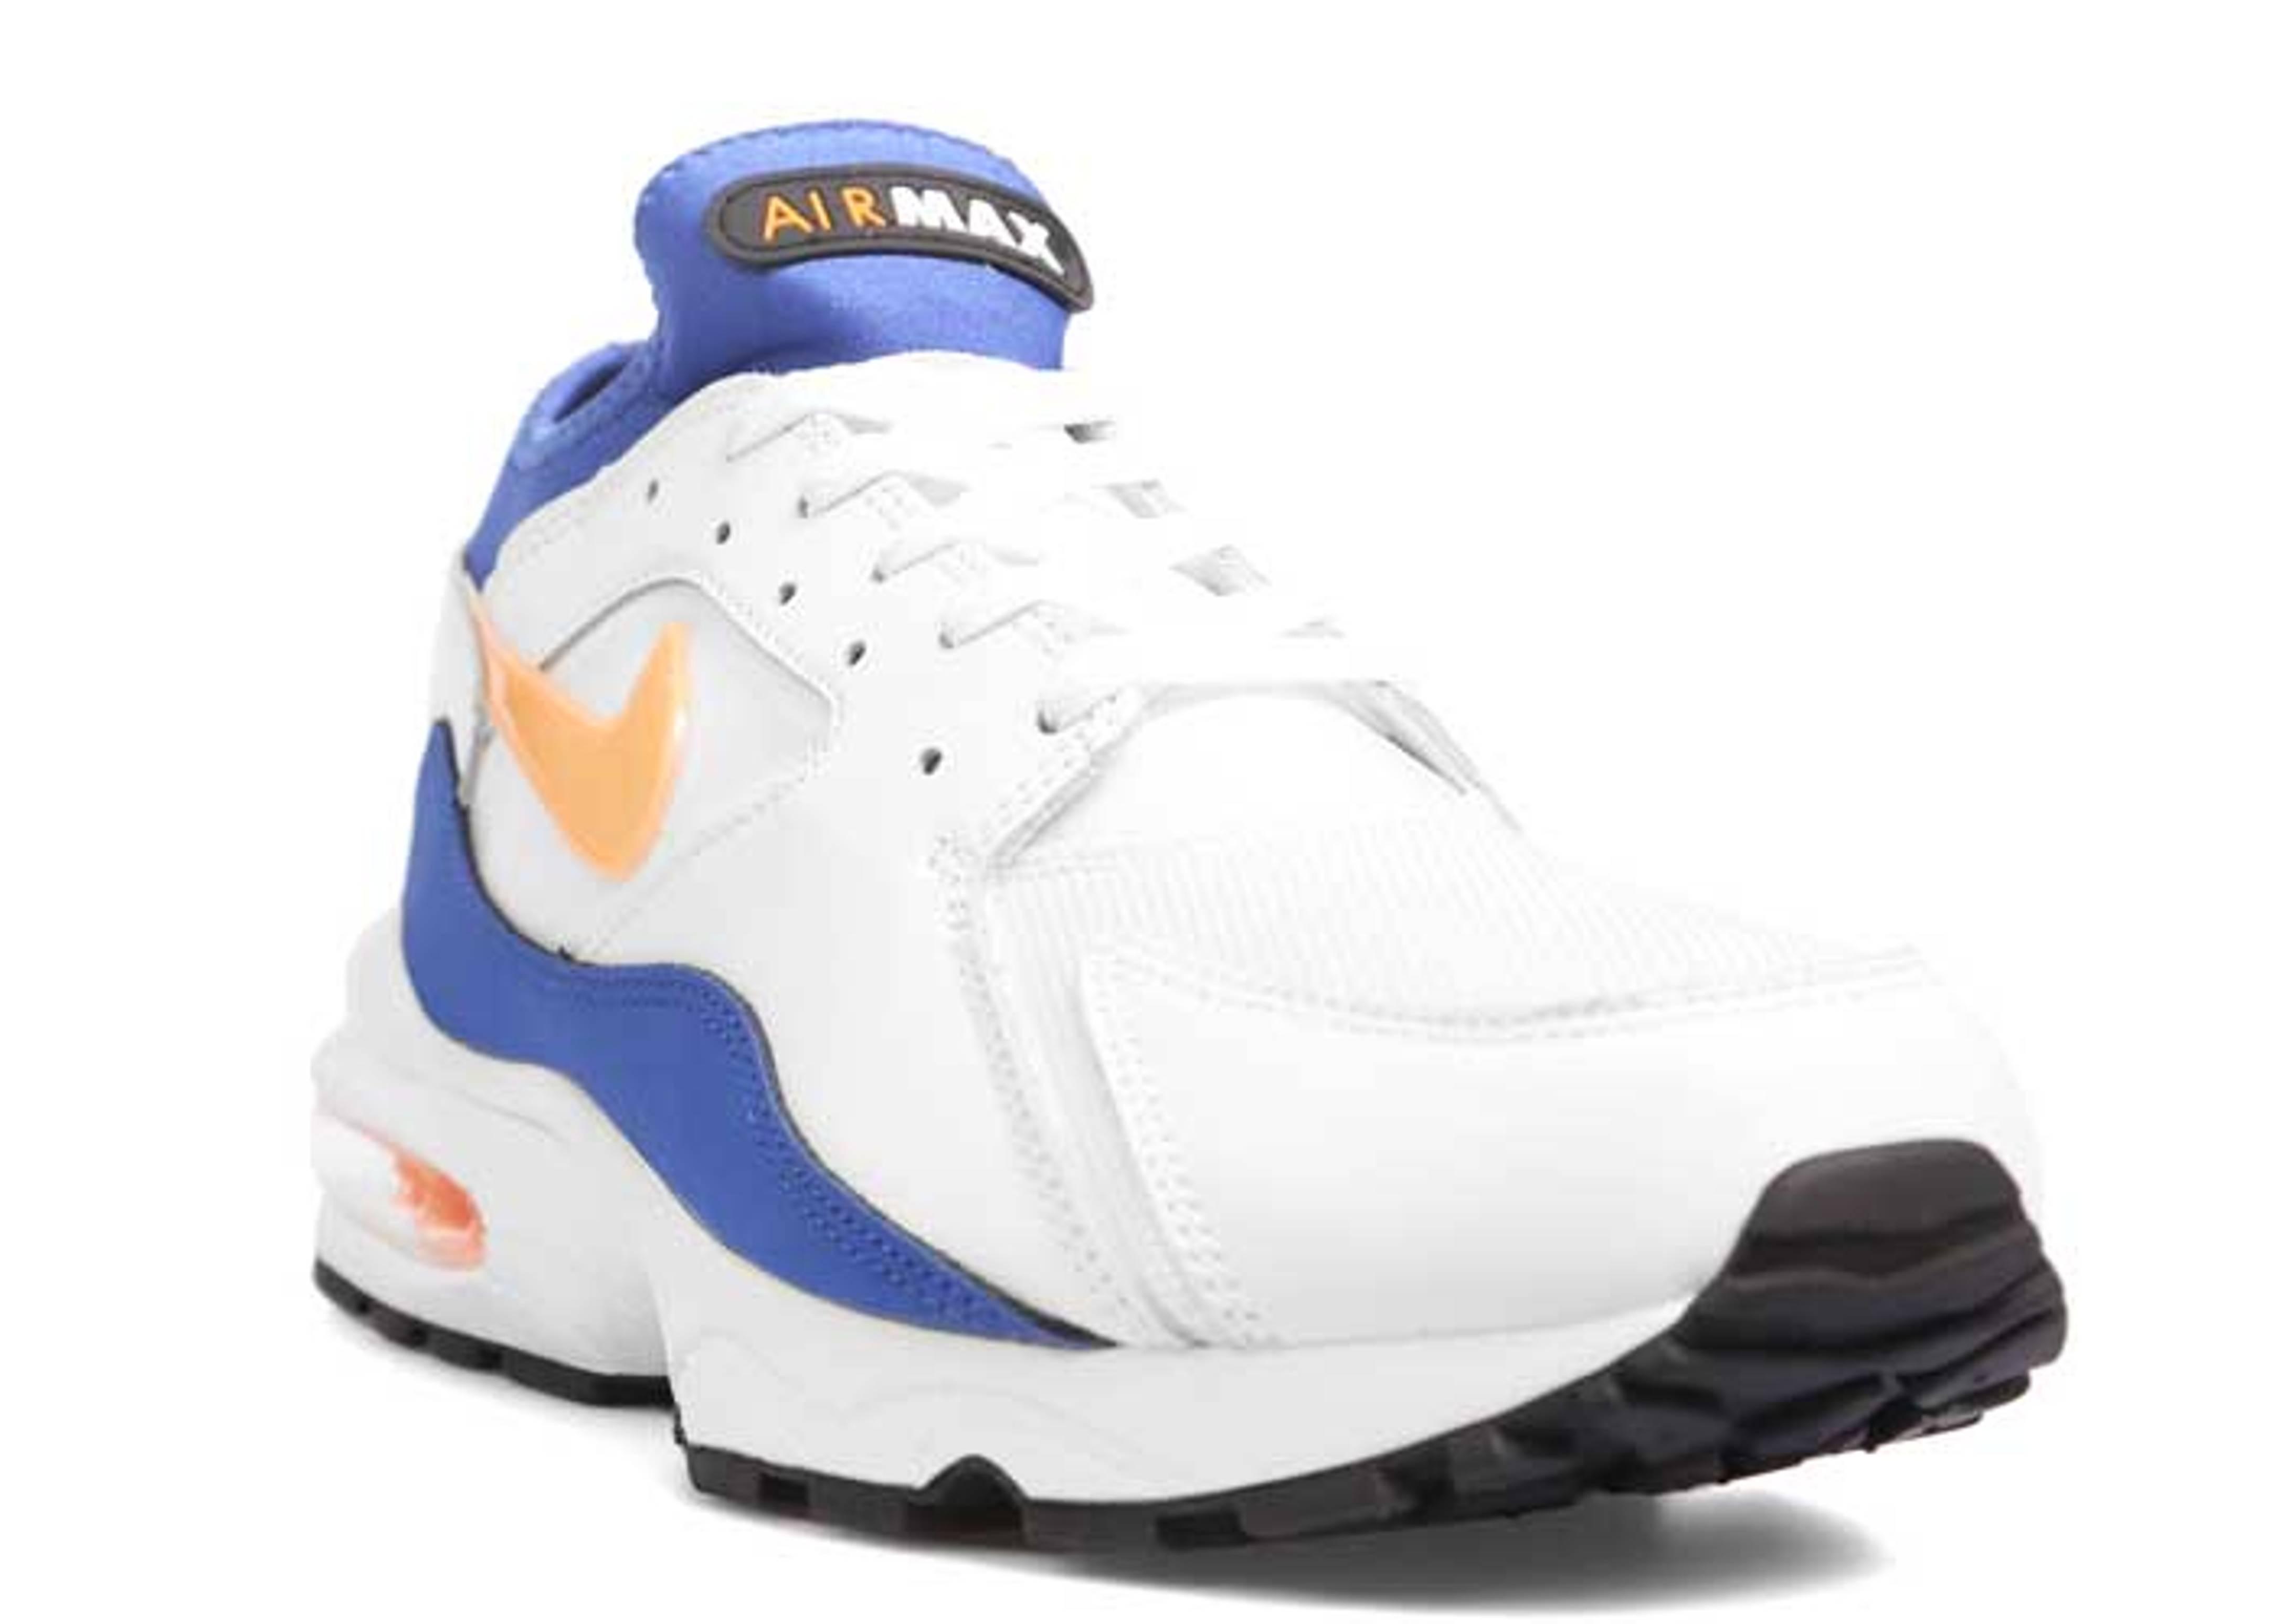 the latest e9dc4 e8ccb Air Max 93 - Nike - 306551 100 - whitebright citrushyper blu ...